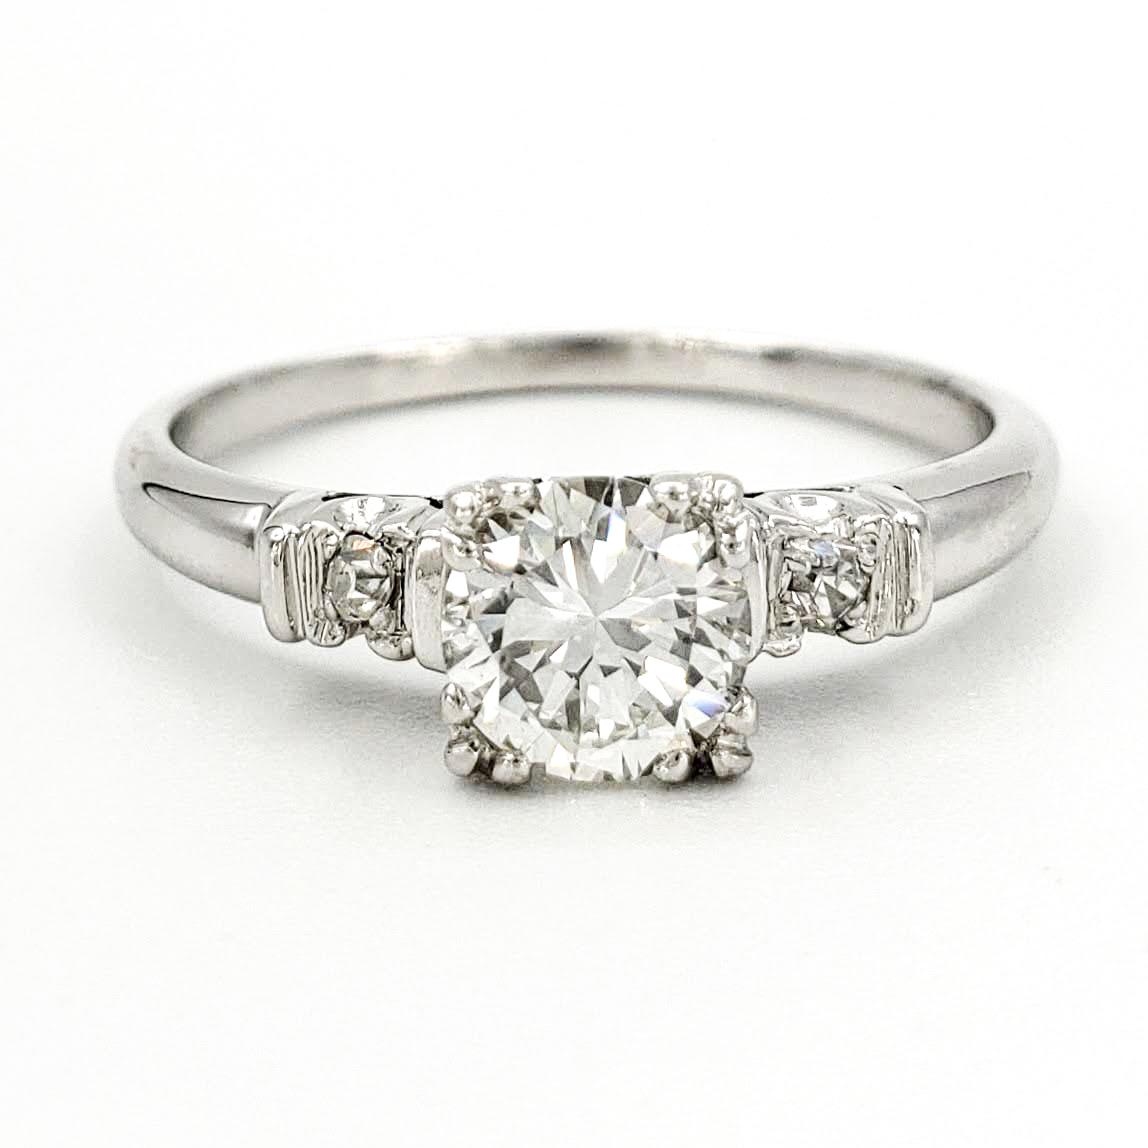 vintage-platinum-engagement-ring-with-0-52-carat-round-brilliant-cut-diamond-egl-g-vs1